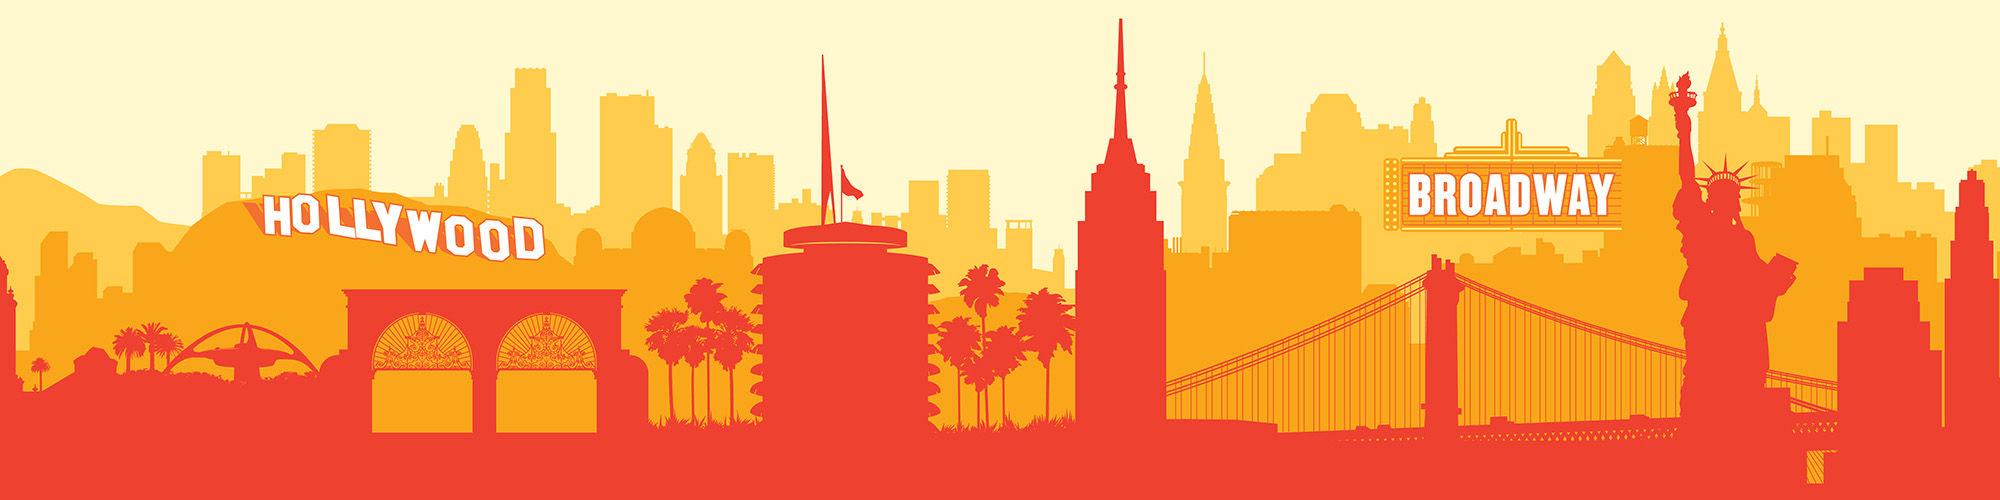 Los Angeles and New York skyline